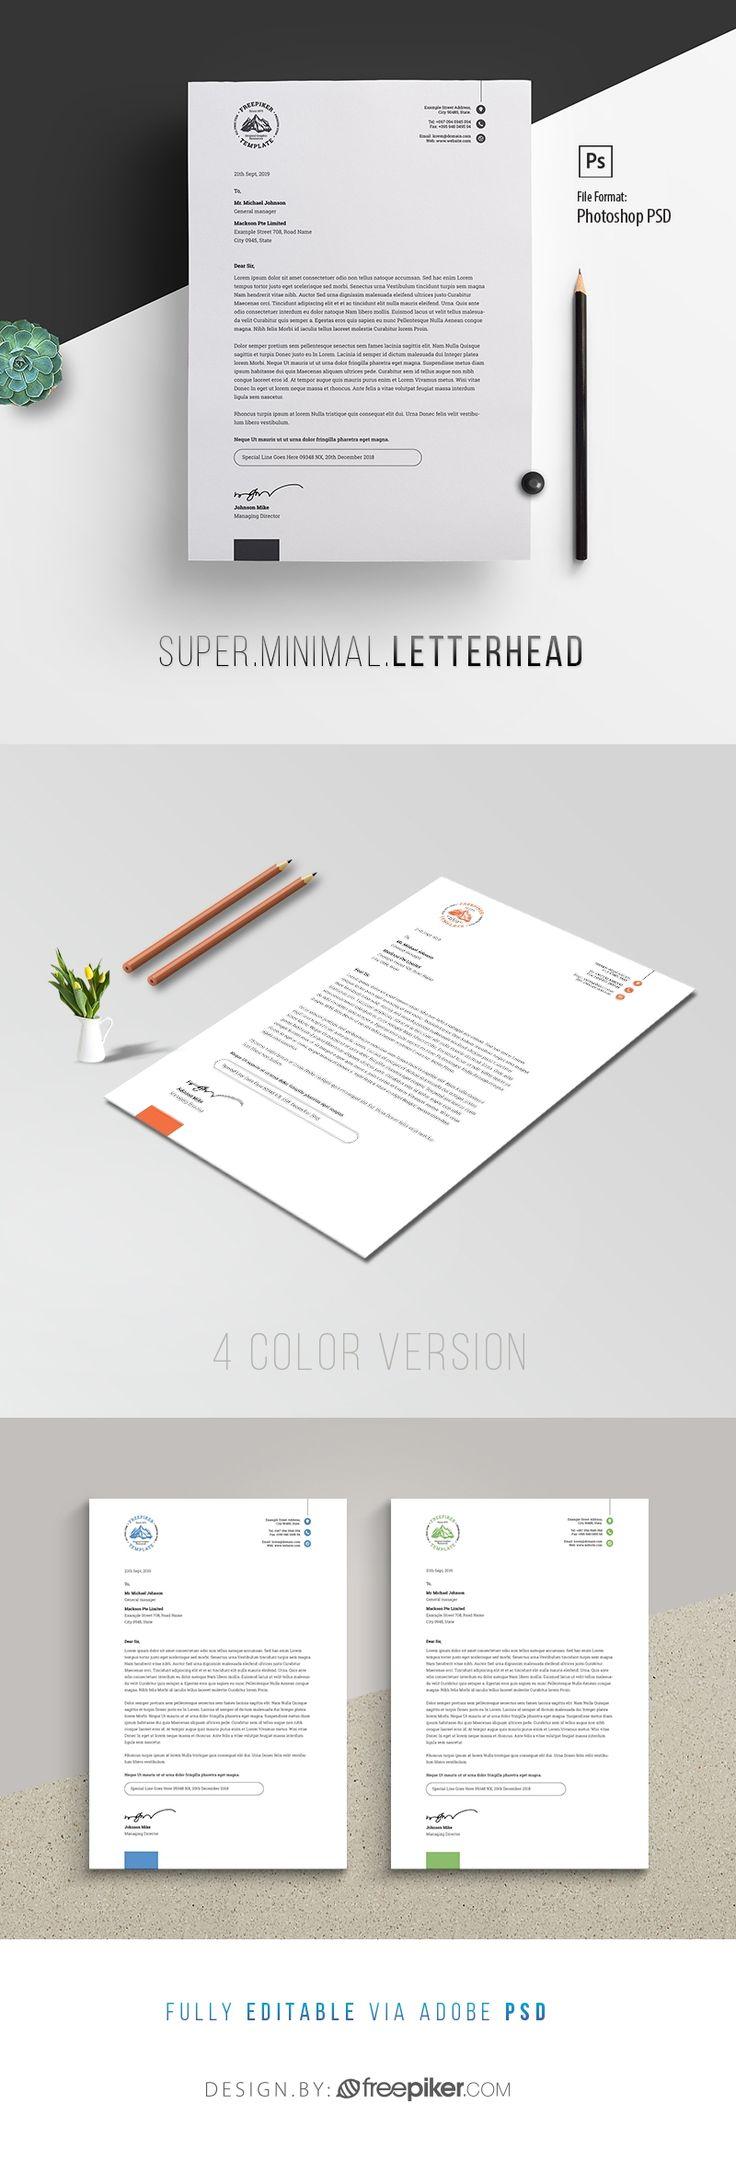 Freepiker minimalist letterhead design di 2020 (Dengan